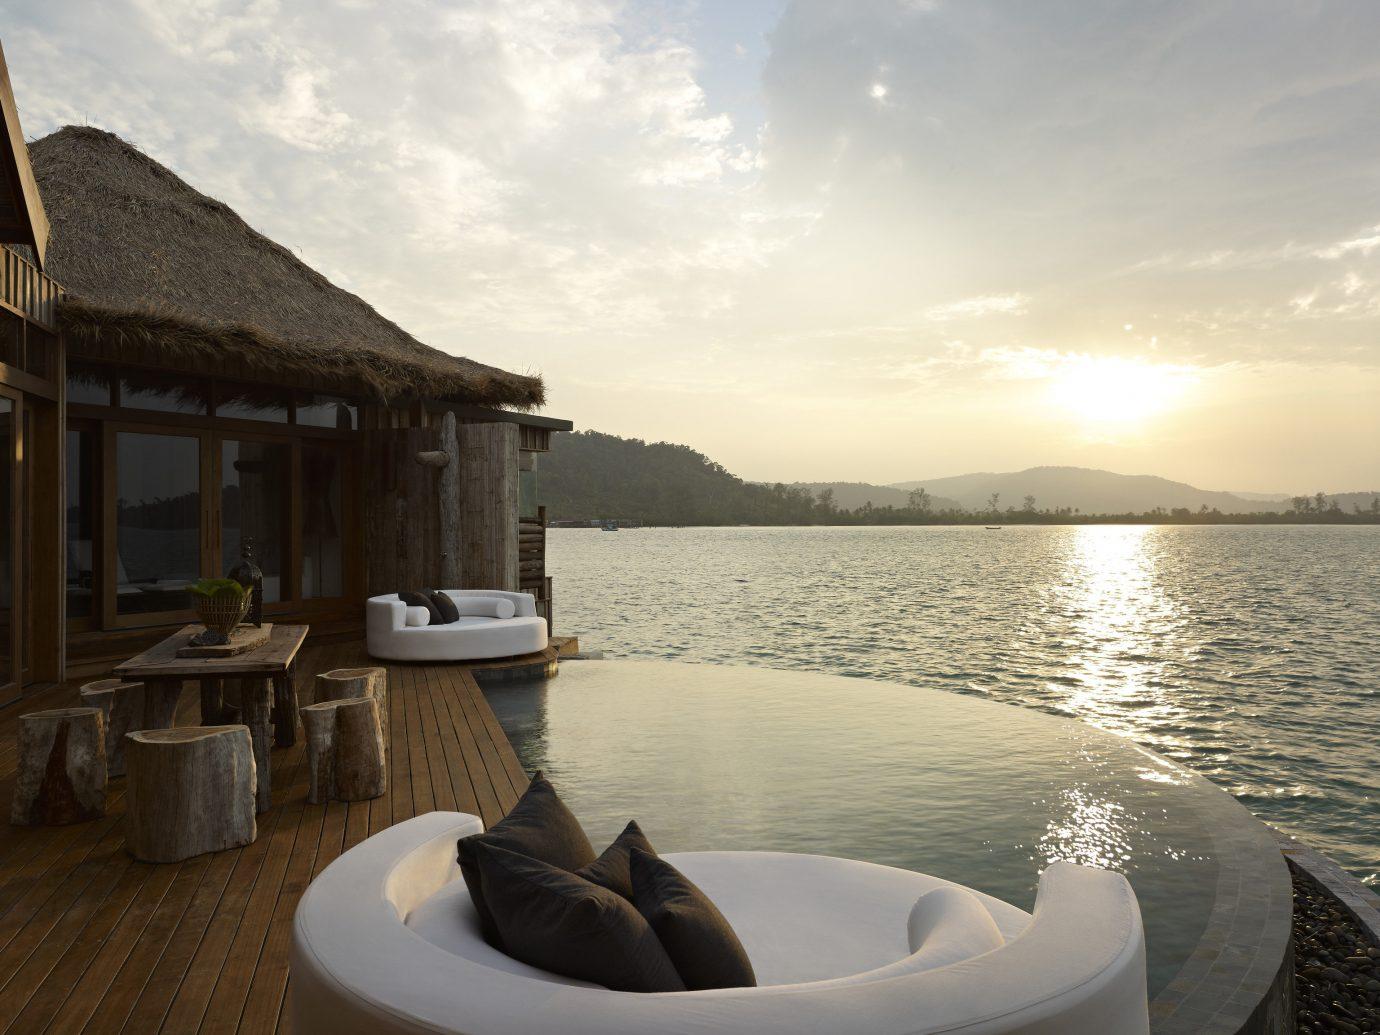 Hotels sky outdoor water vehicle Sea vacation Boat bay